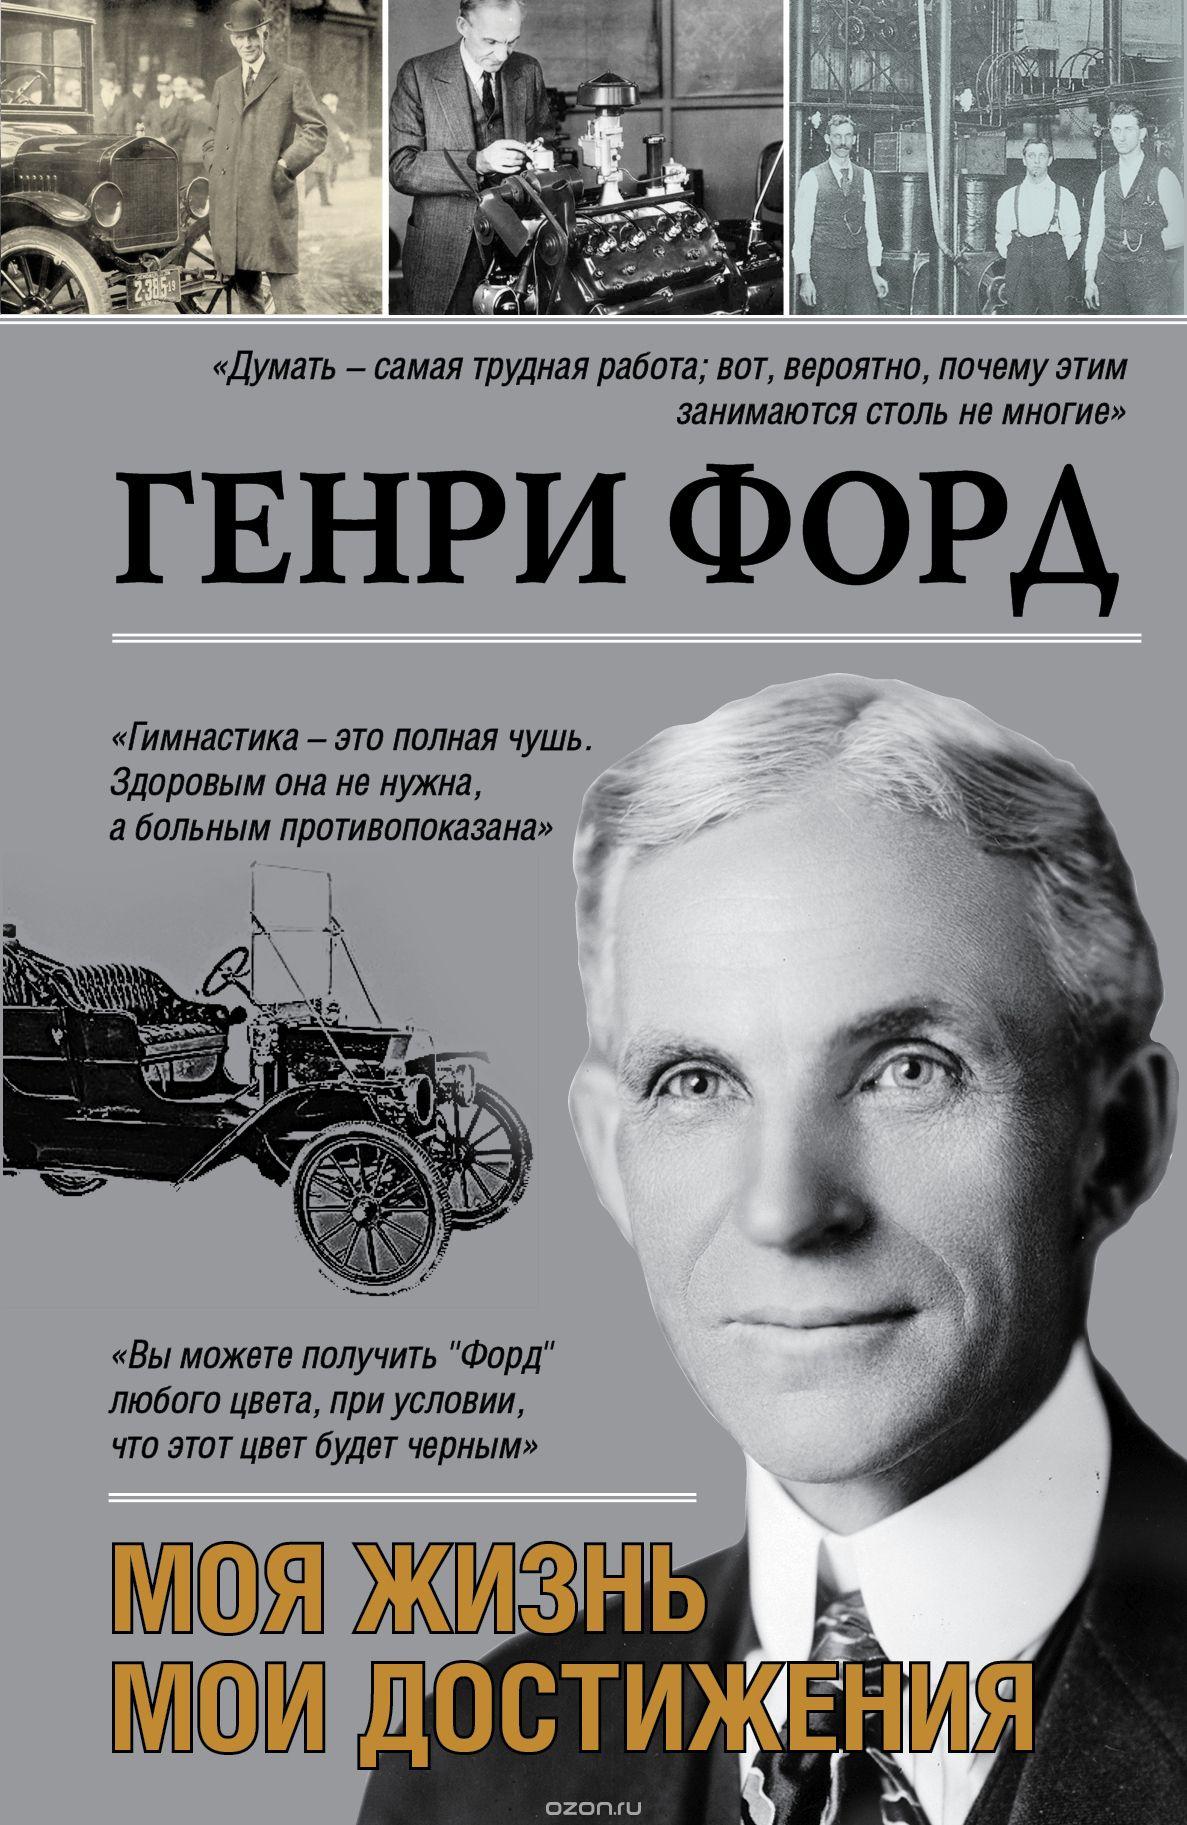 Генри Форд, Моя жизнь, мои достижения